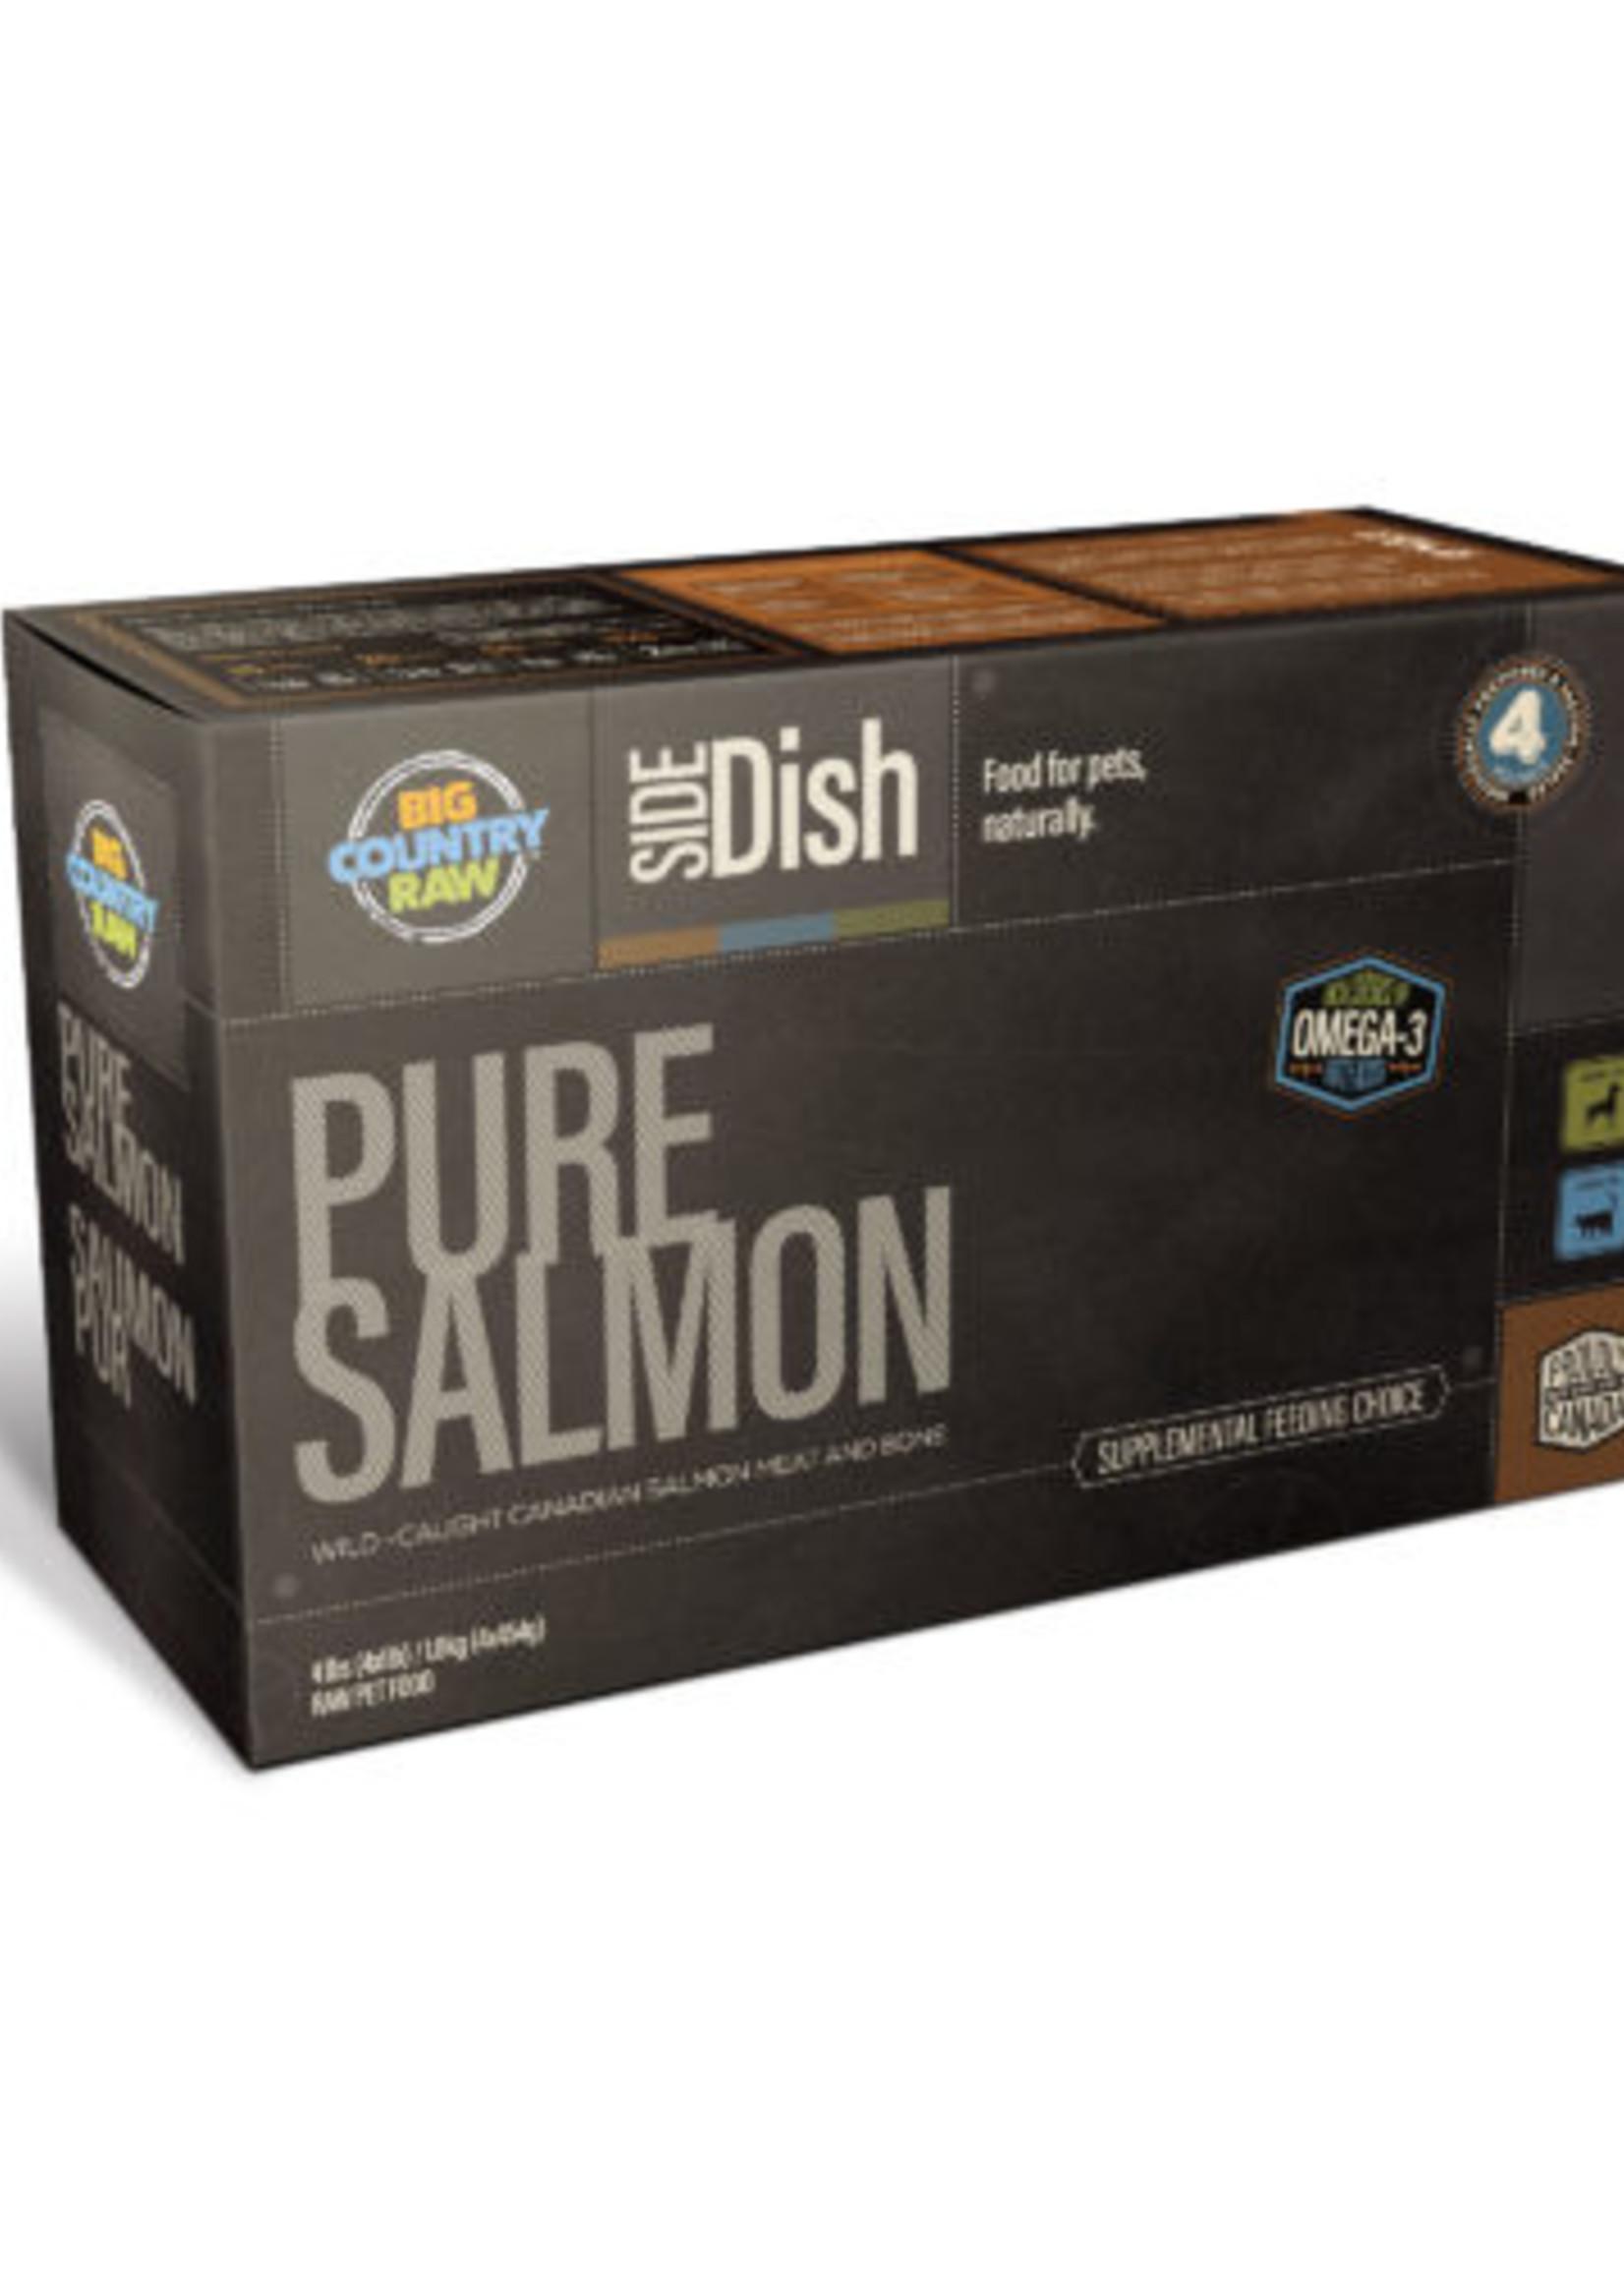 Big Country Raw Big Country Raw Pure Salmon Carton 4lbs